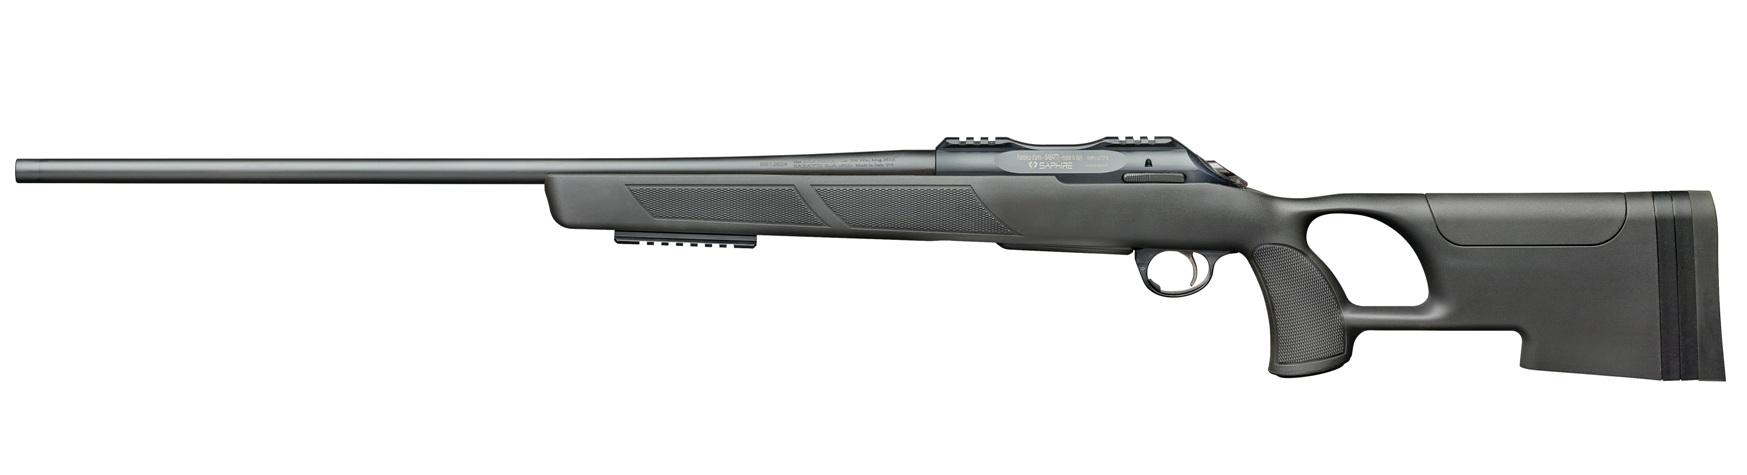 Saphire ER 5